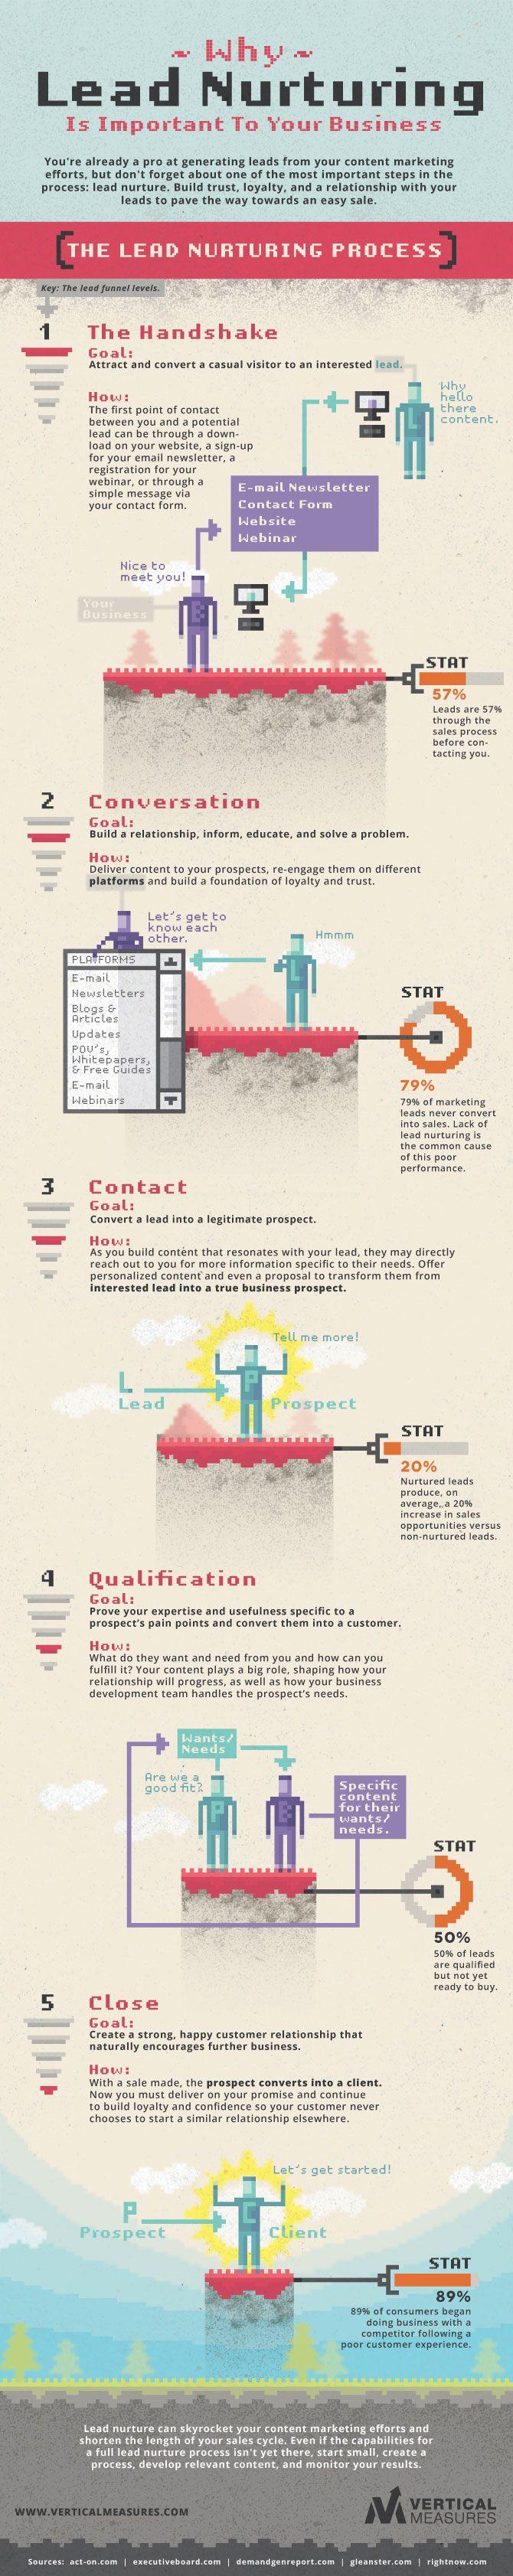 http://social-media-strategy-template.blogspot.com/ Lead Nurturing Process - #infographic #marketing